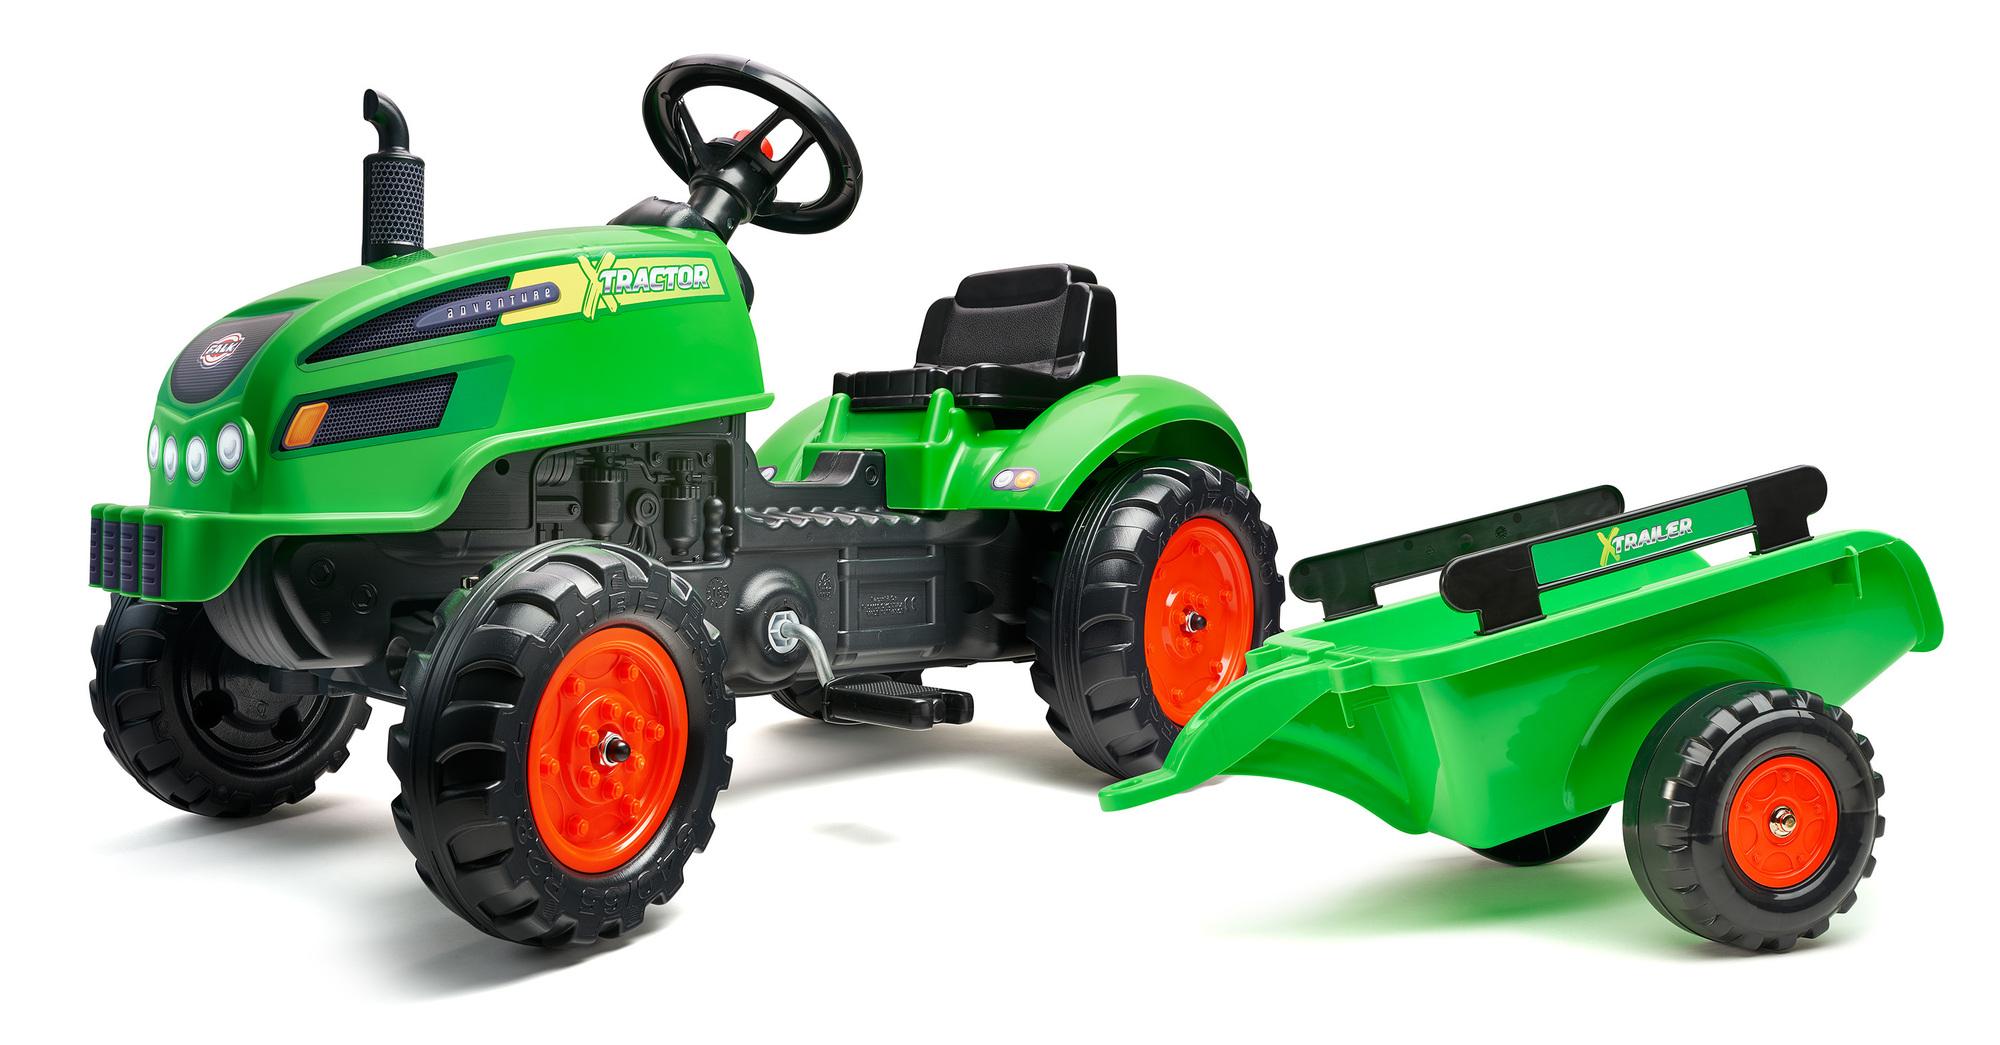 FALK Šliapací traktor 2048AB X-Tractor s vlečkou a otváracou kapotou